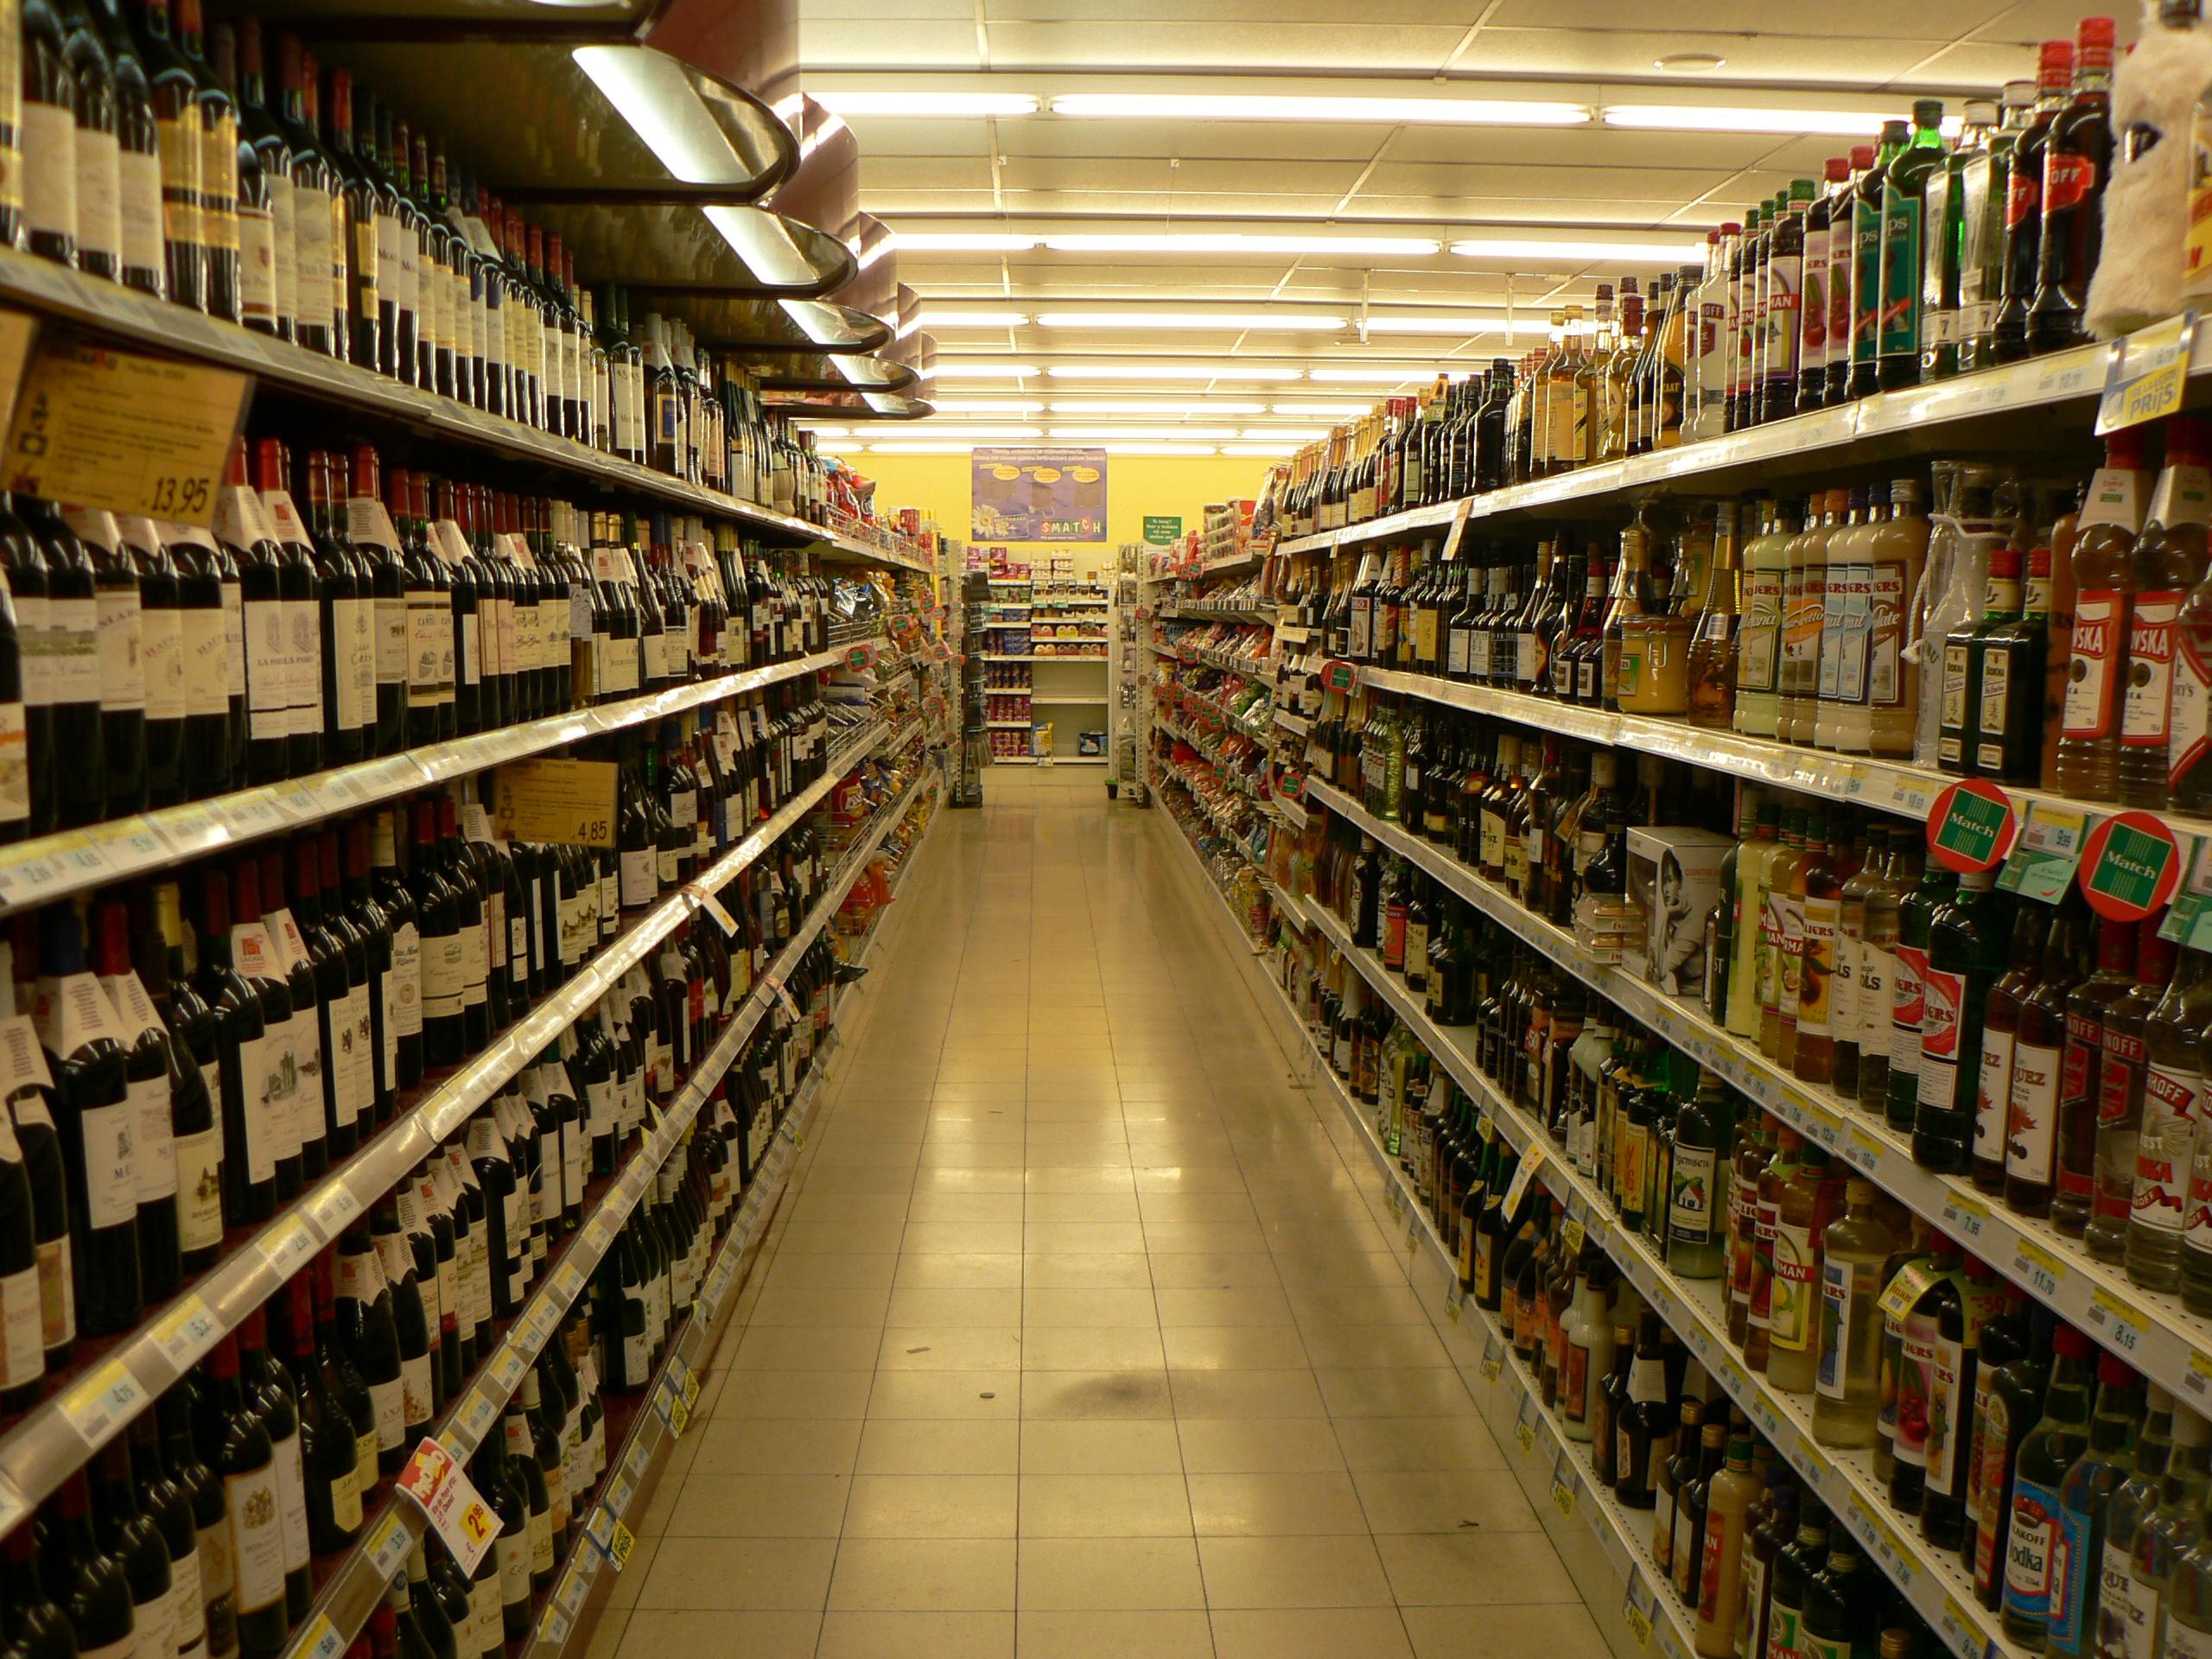 0fff4a760494 Супермаркет — Википедия